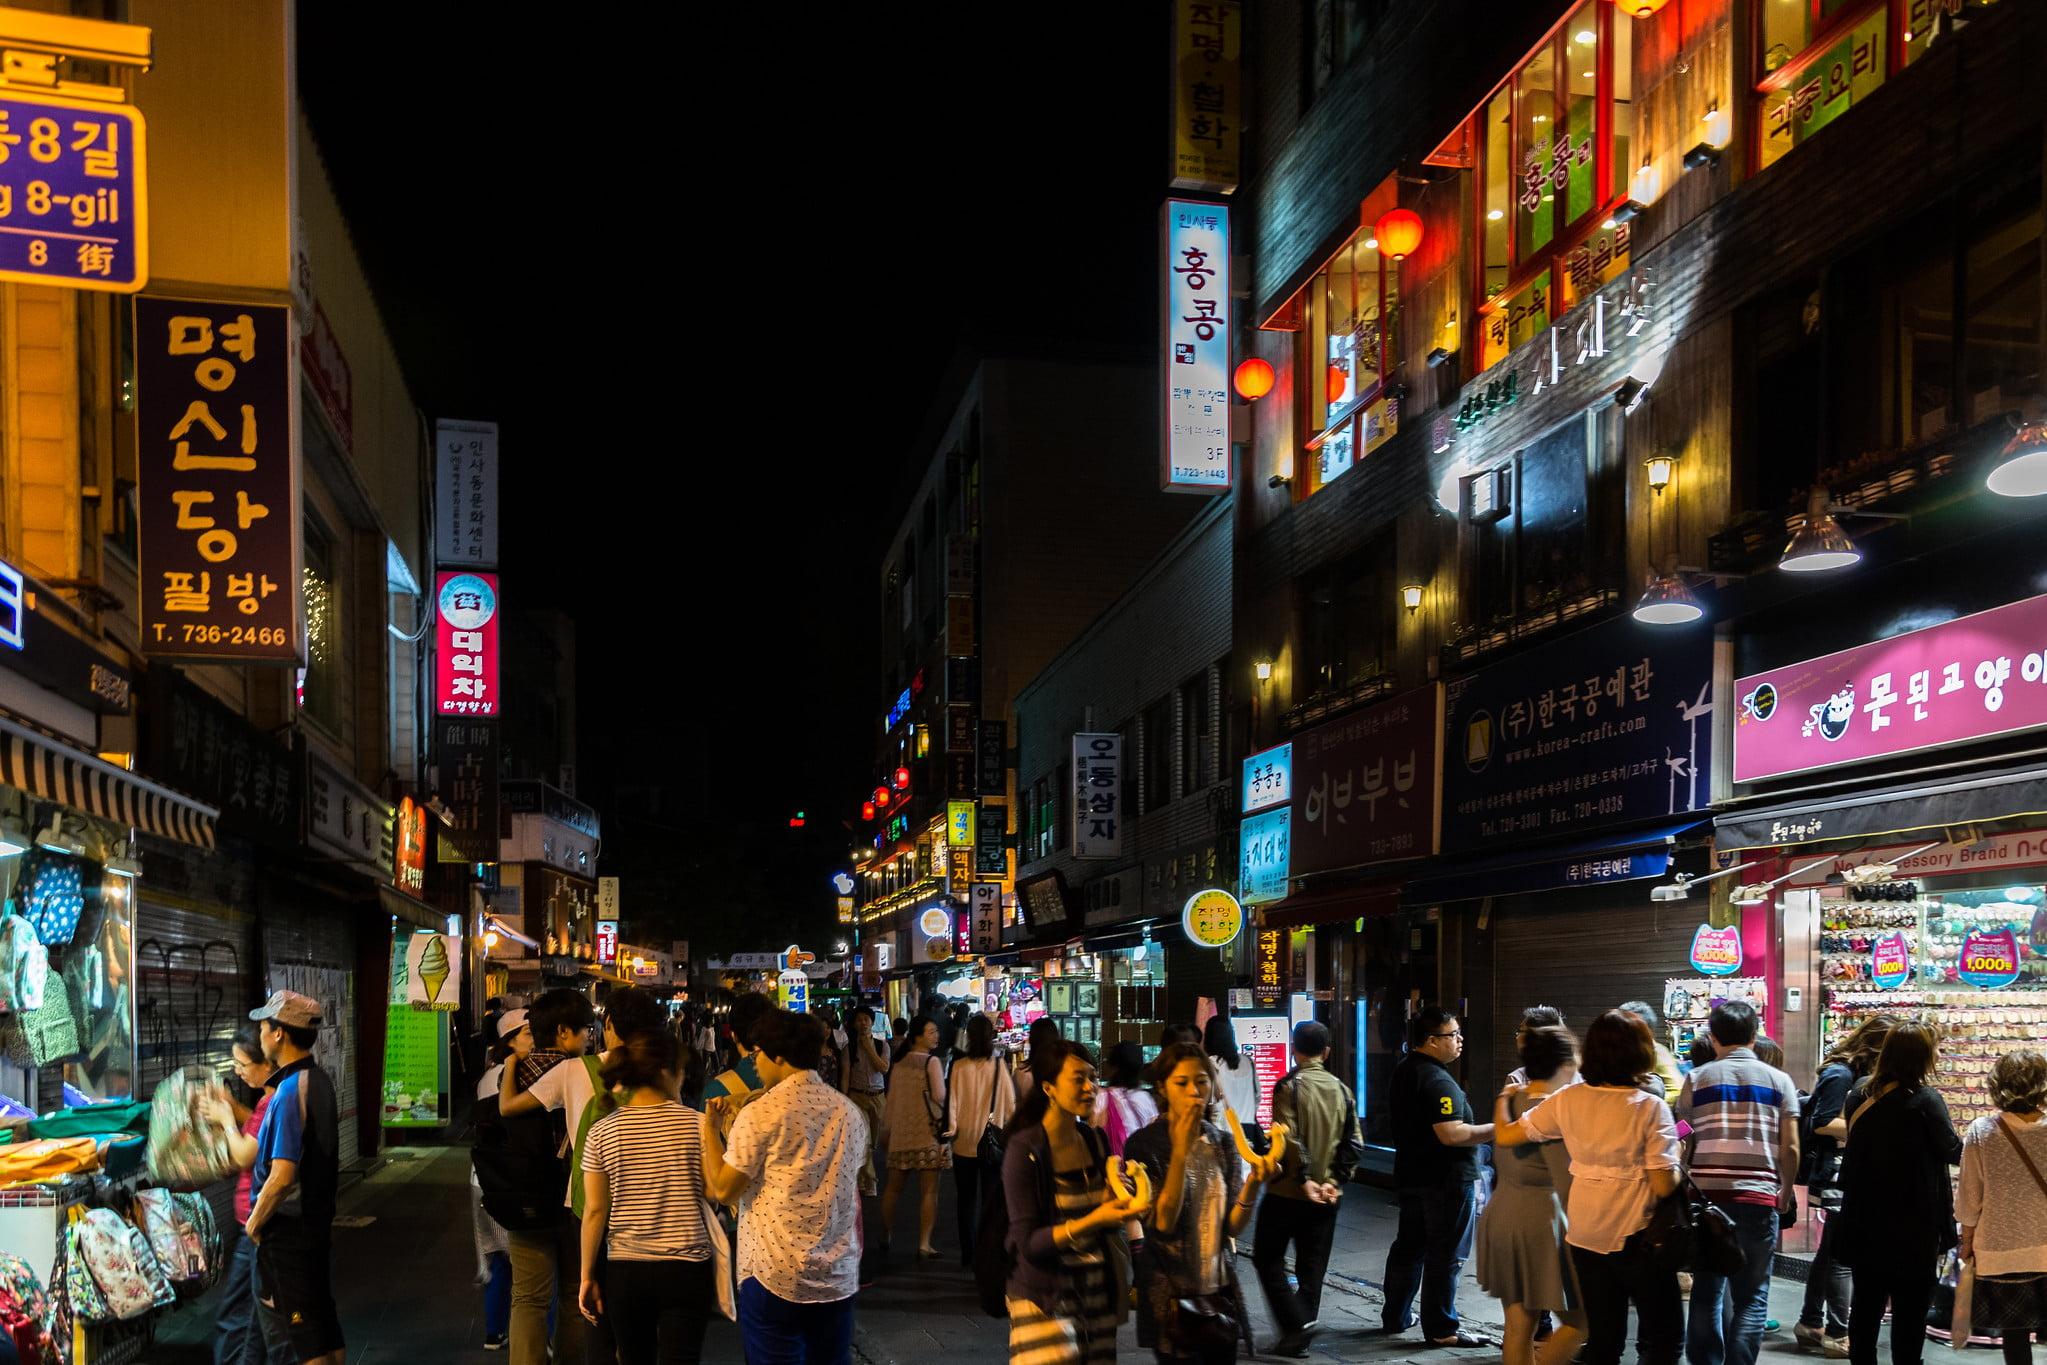 Seoul, South Korea at night - photo by dconvertini under CC BY-SA 2.0